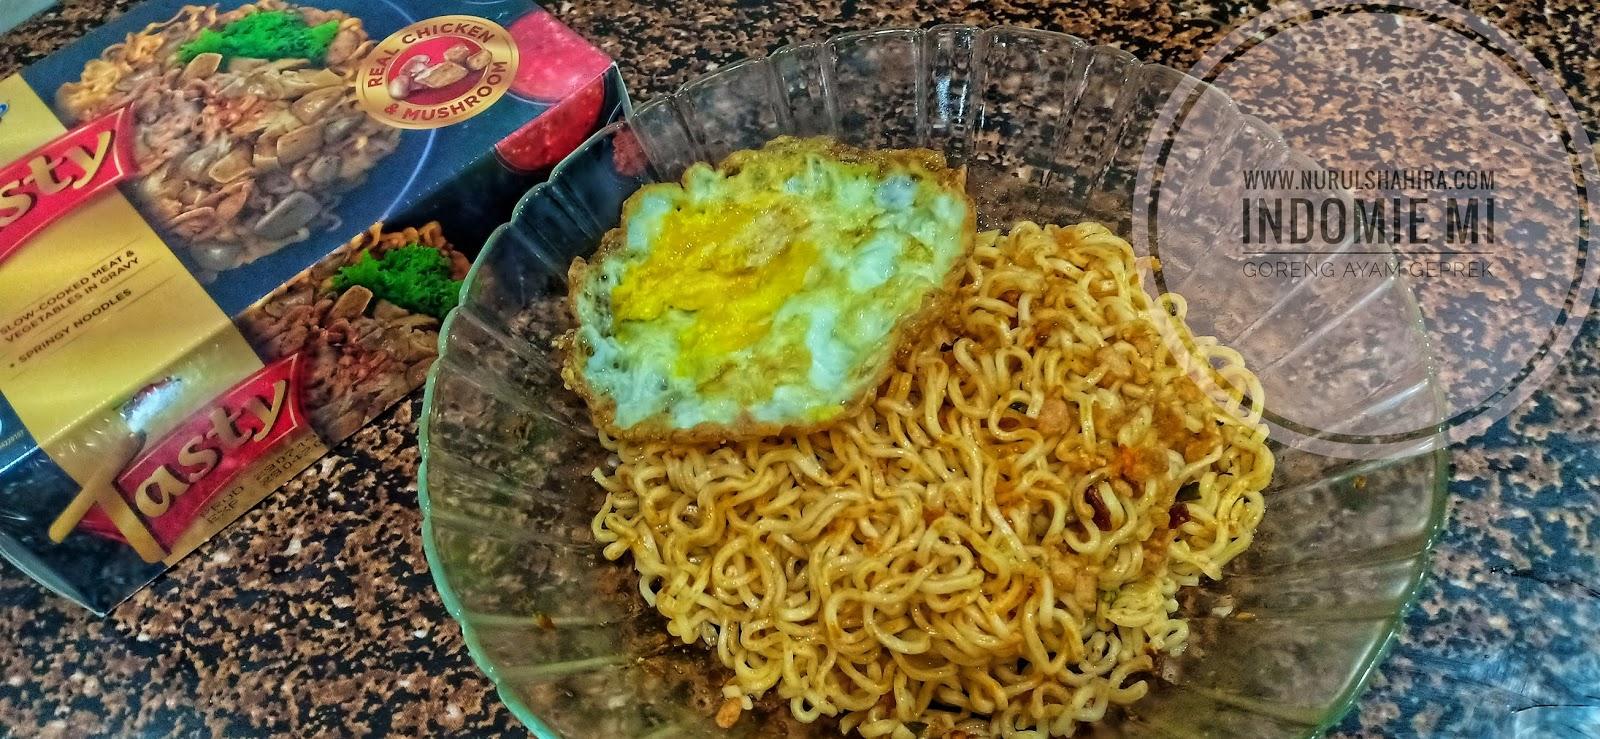 Review Rasa IndoMie Mi Goreng Ayam Geprek